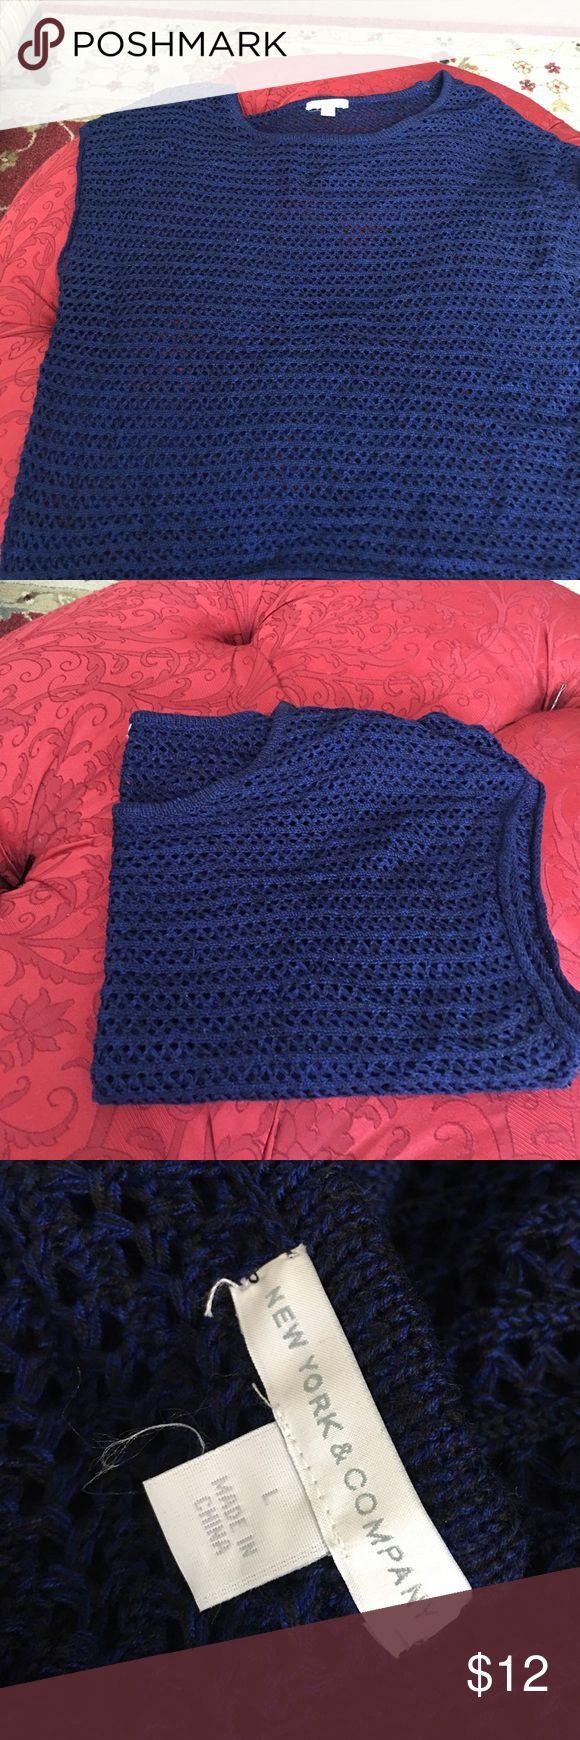 New York and company  navy cap sleeve sweater New York and company navy blue cap sleeve sweater. New York & Company Sweaters